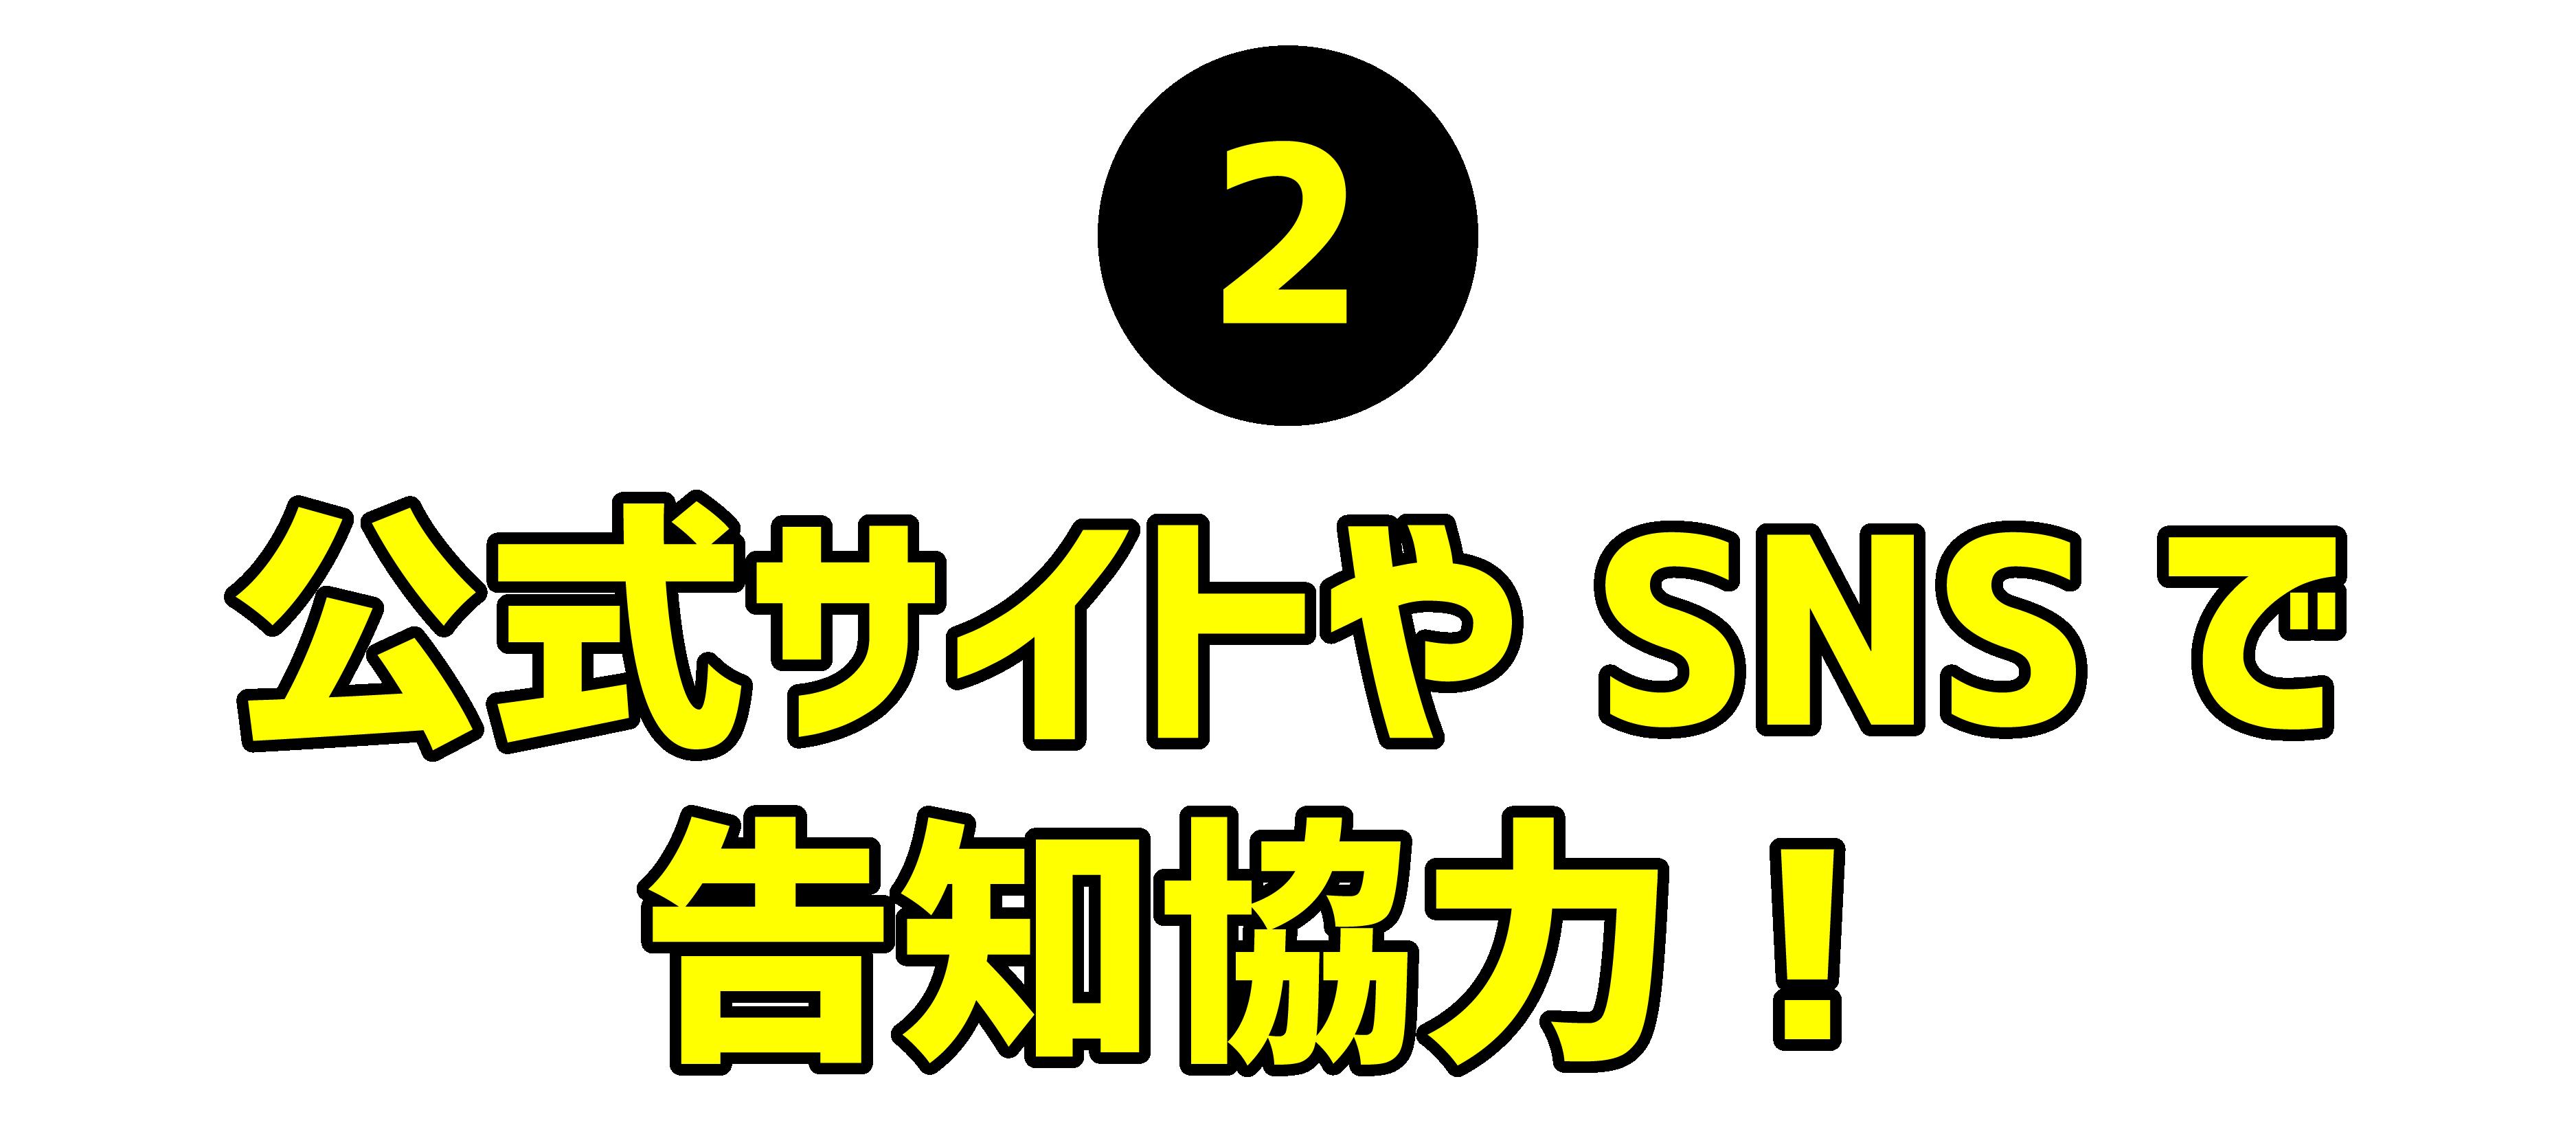 lp_text_02-02